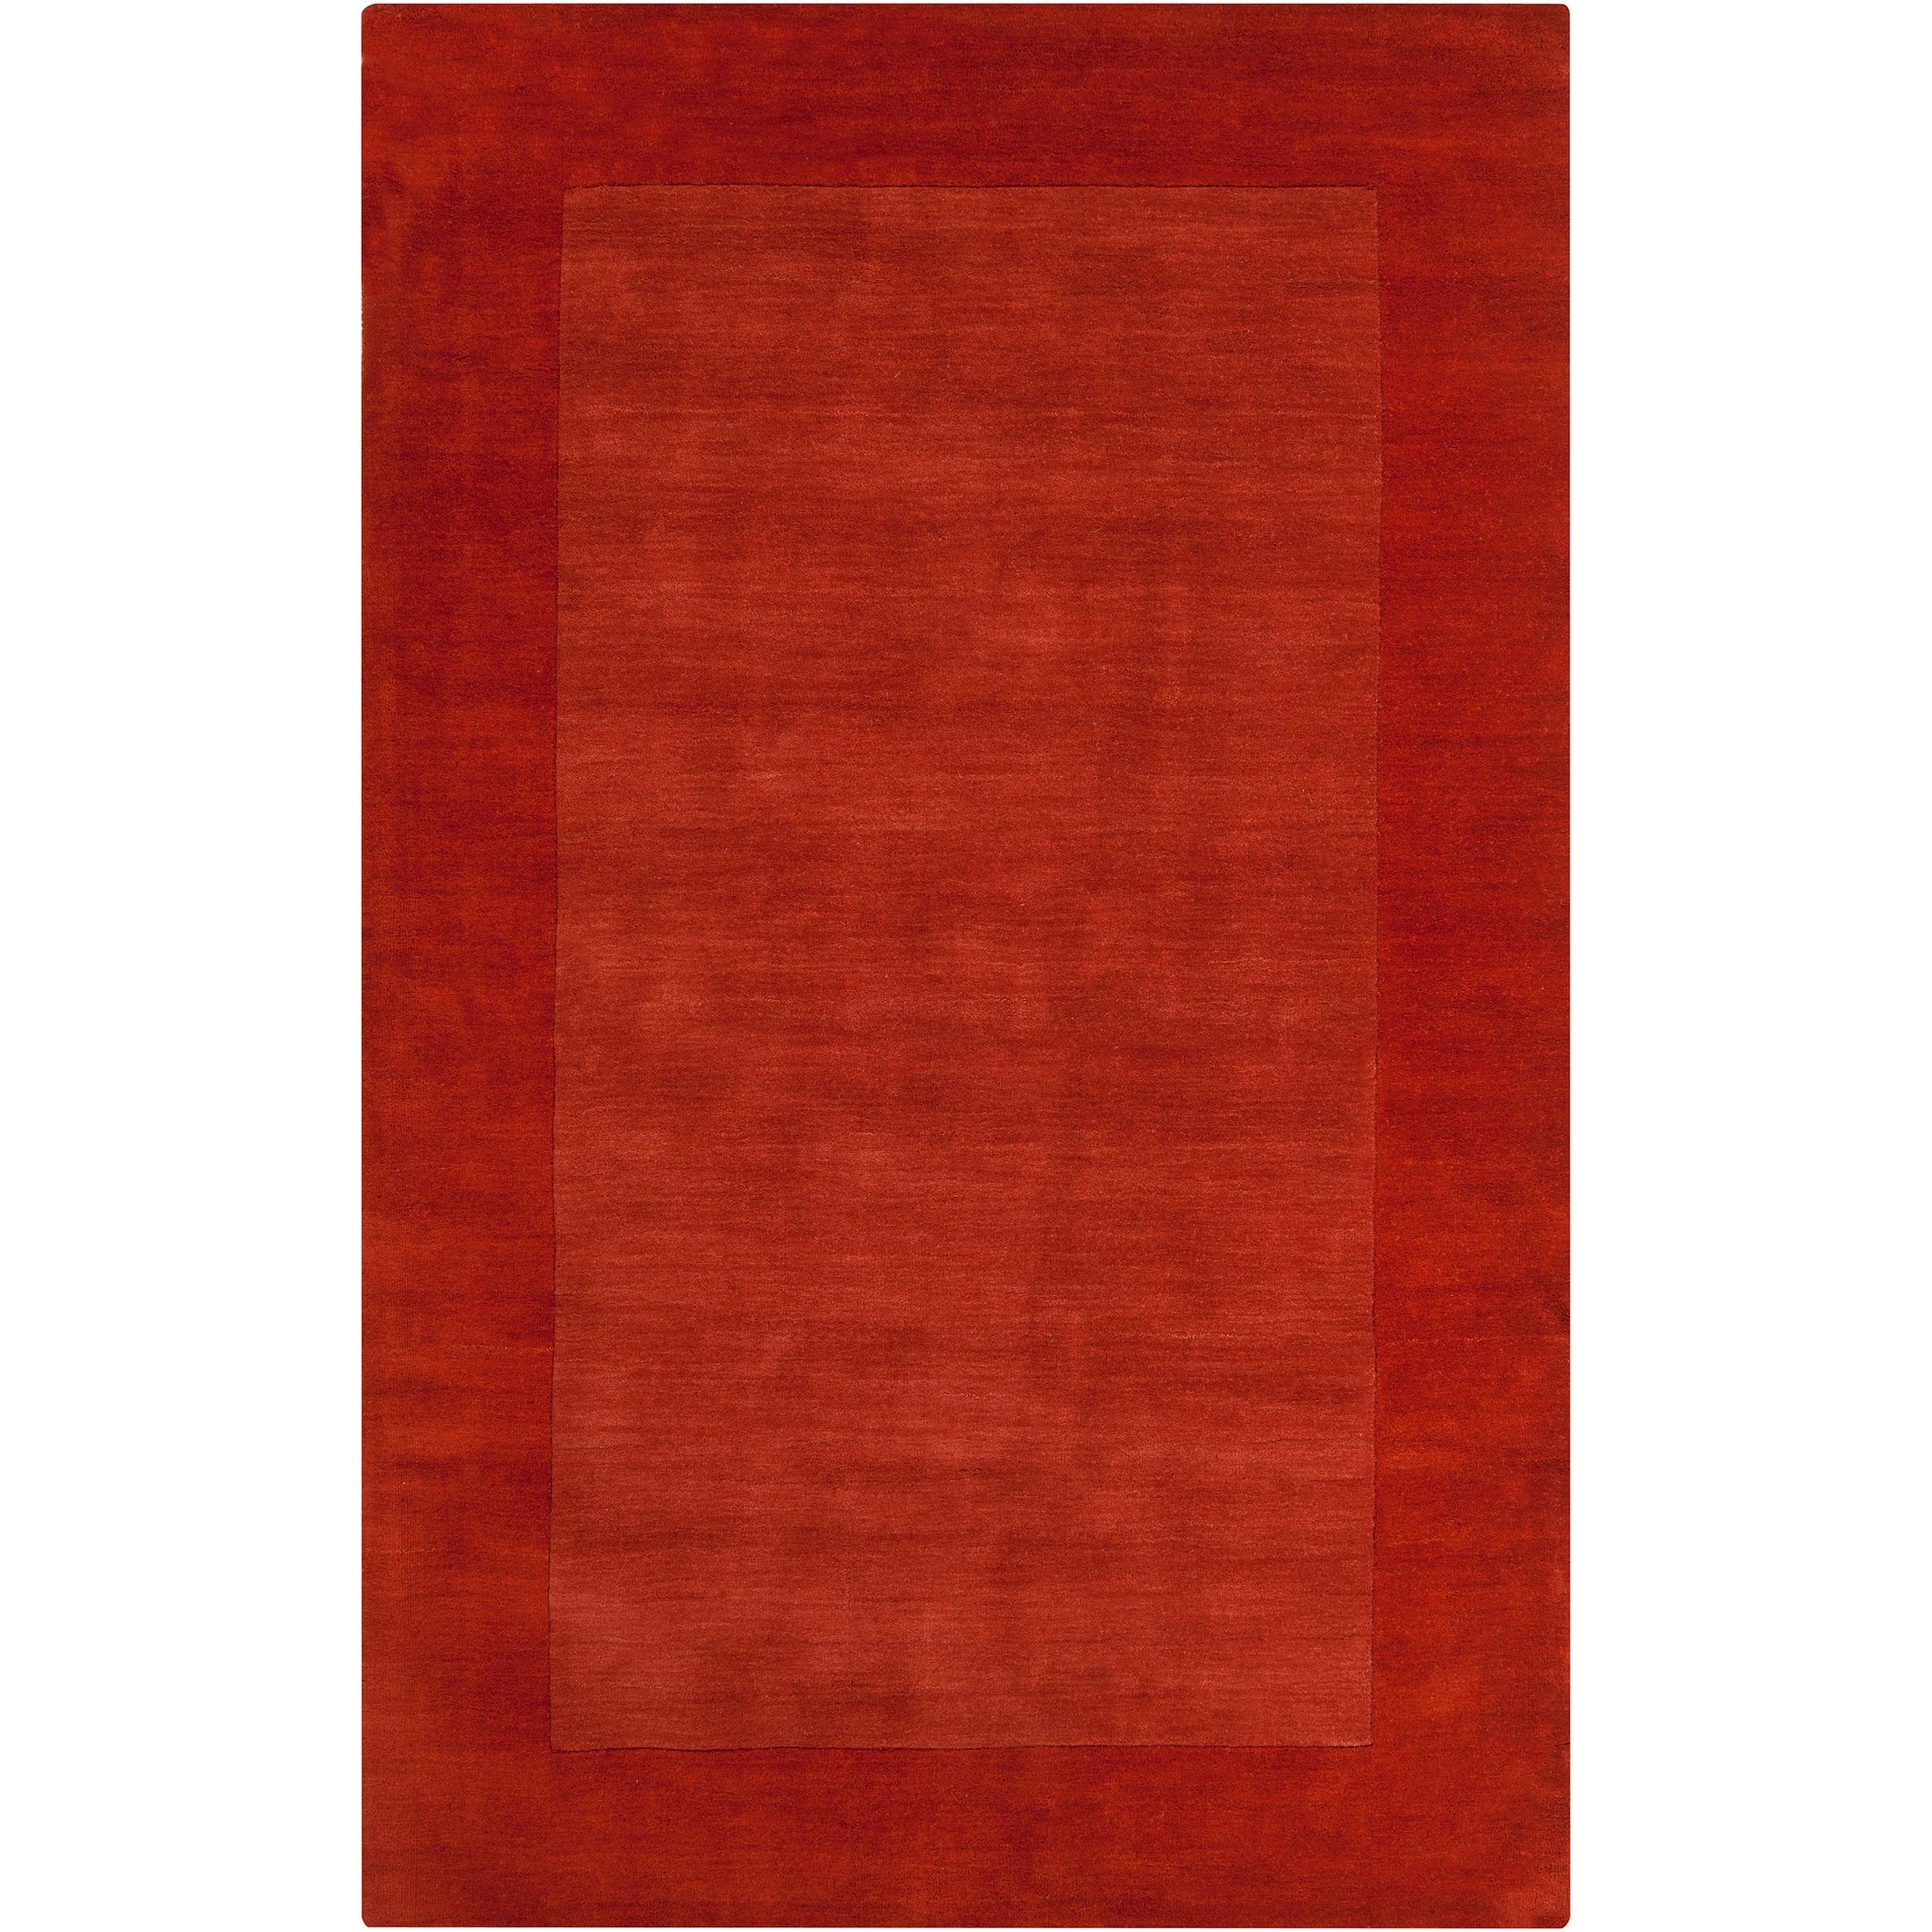 Hand-crafted Orange Tone-On-Tone Bordered Pechora Wool Rug (5' x 8')